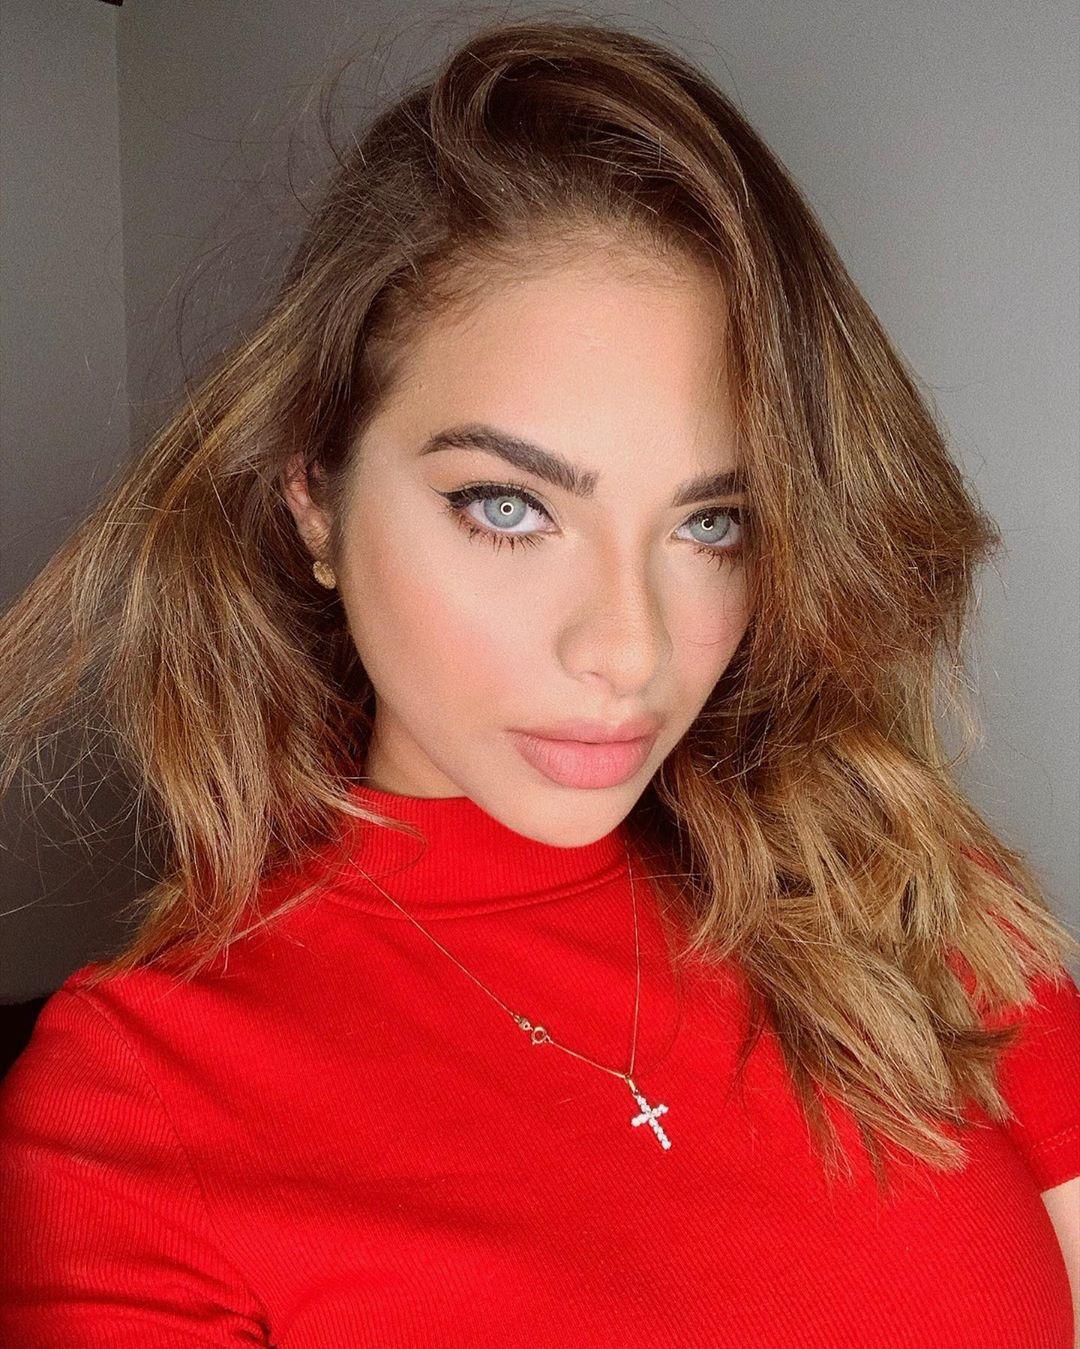 Daniela-Acuna-Macias-Wallpapers-Insta-Fit-Bio-4